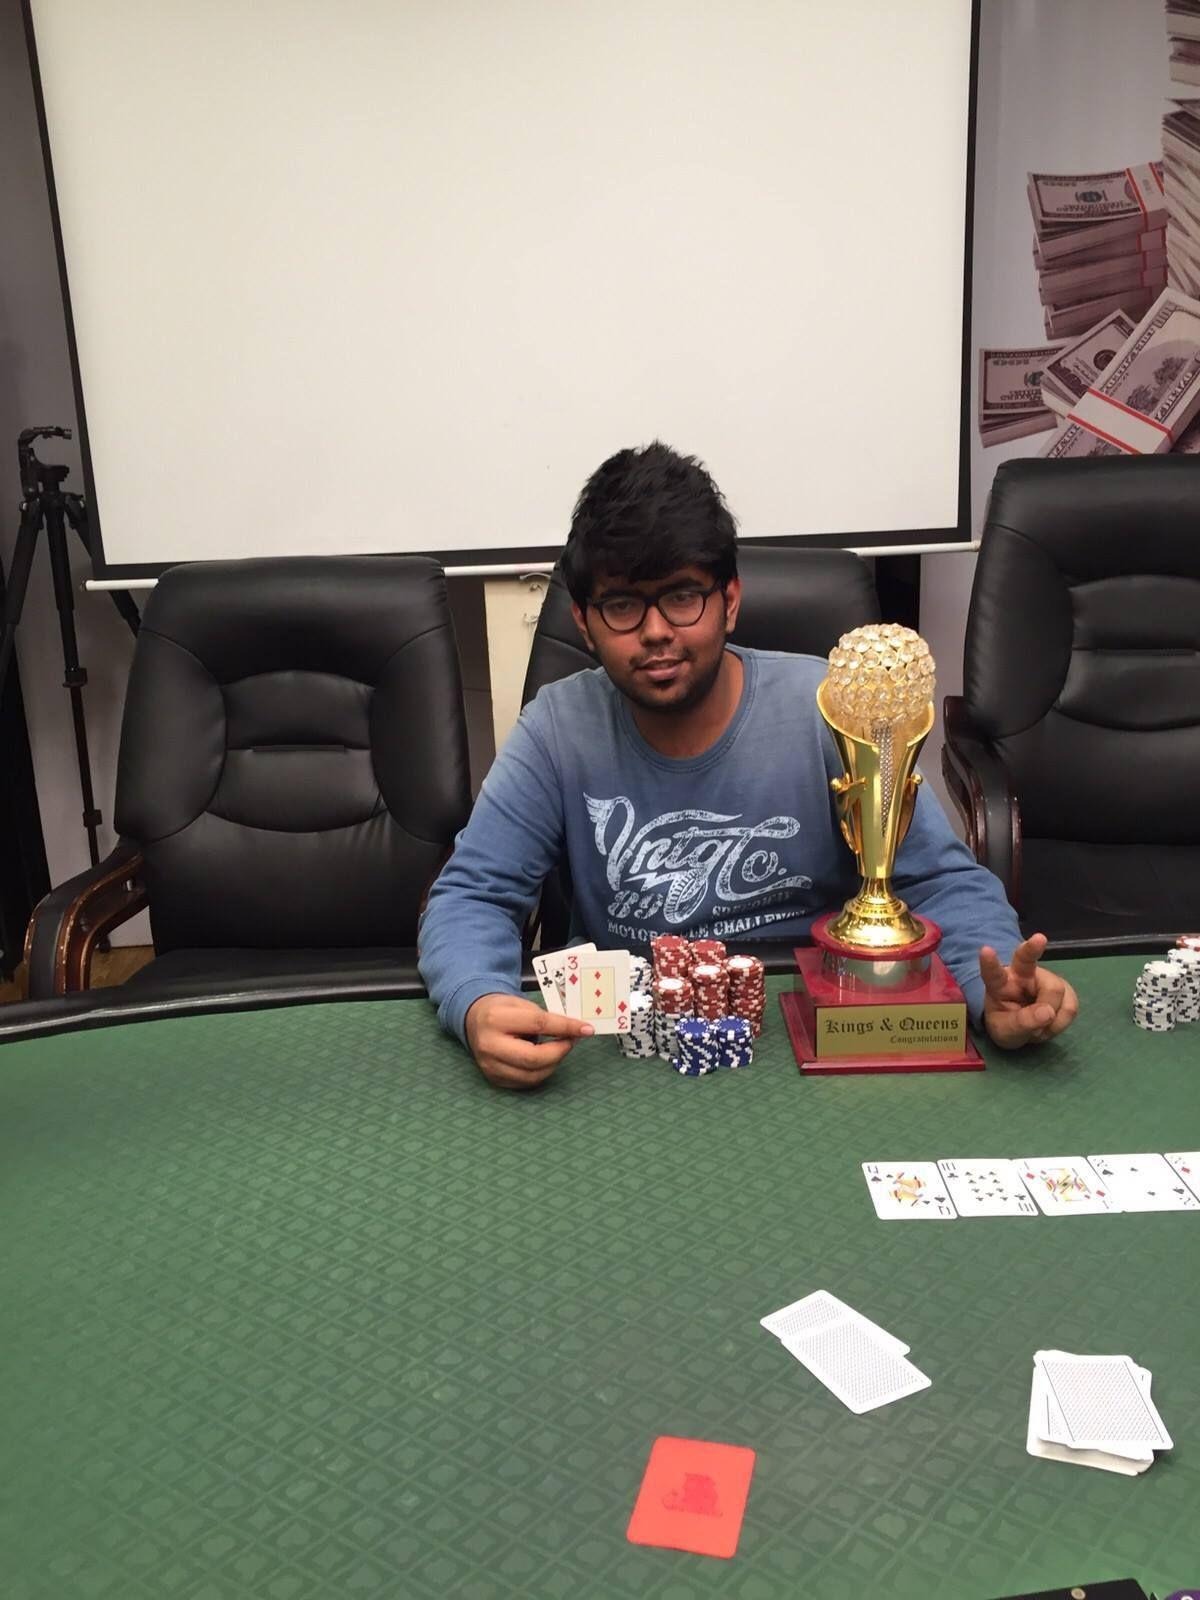 Legal gambling age in canada ontario